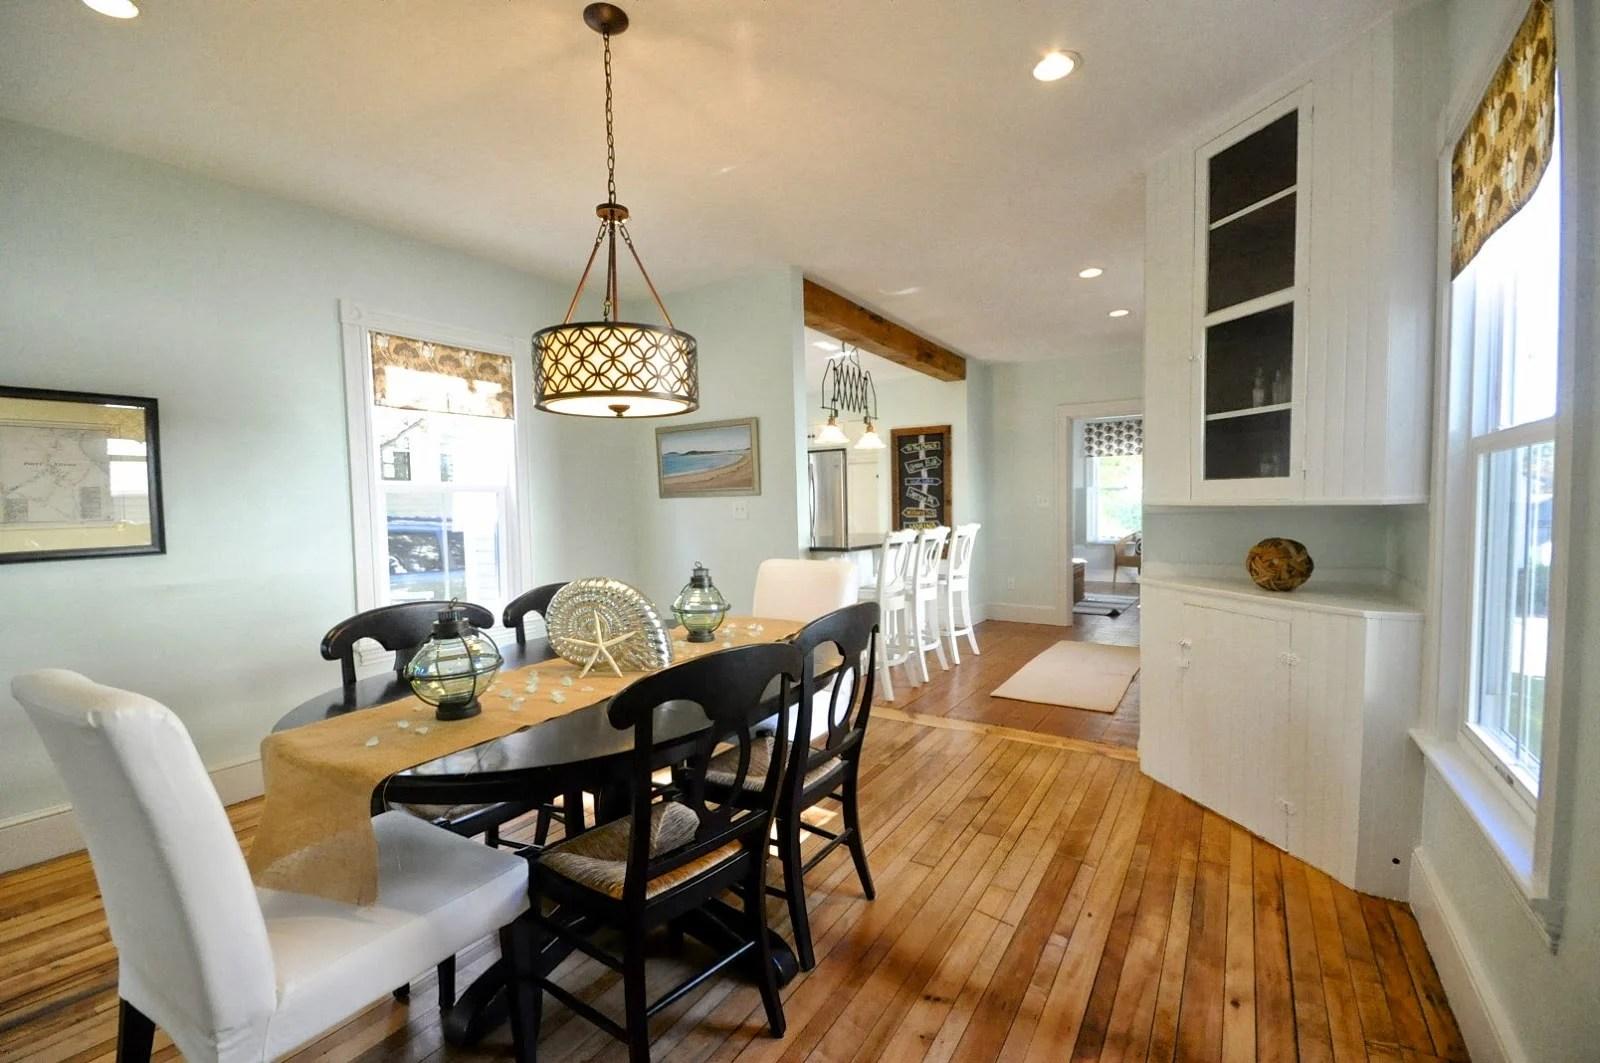 Dining Room Remodel Pictures Home Decoration Interior House Designer